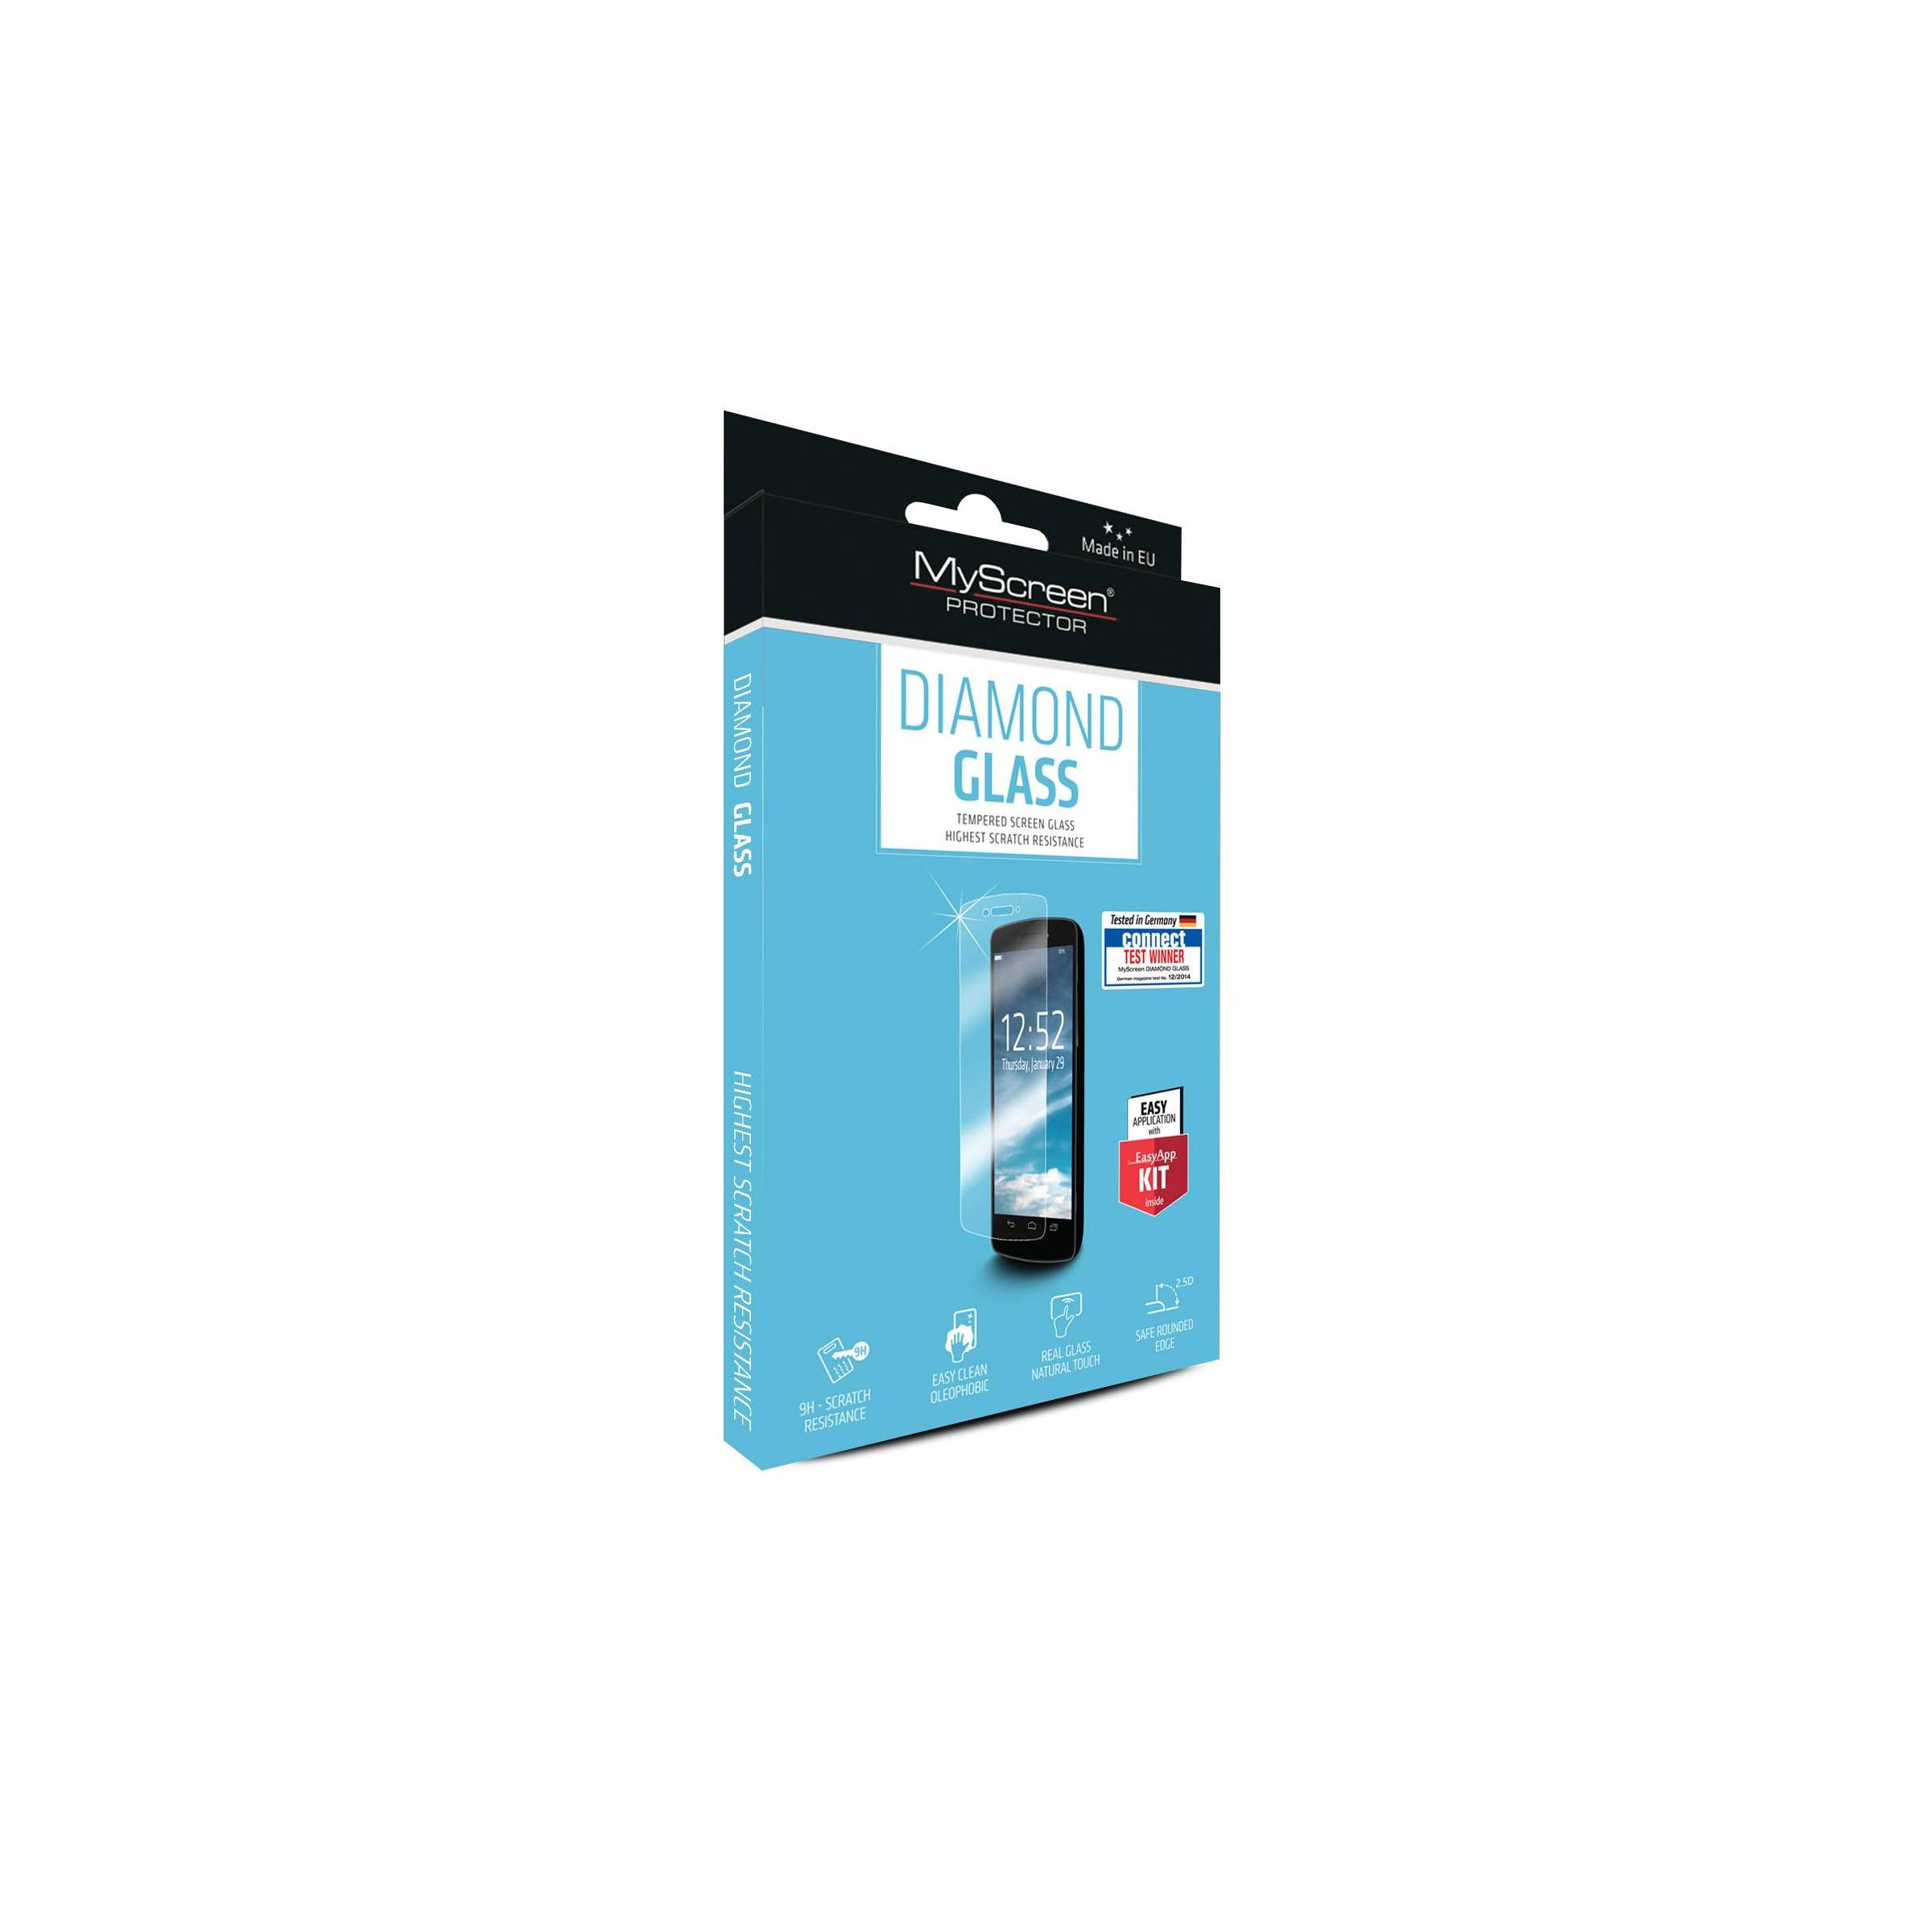 myscreen Myscreen diamond iphone 5/5s/se beskyttelsesglas fra mackabler.dk